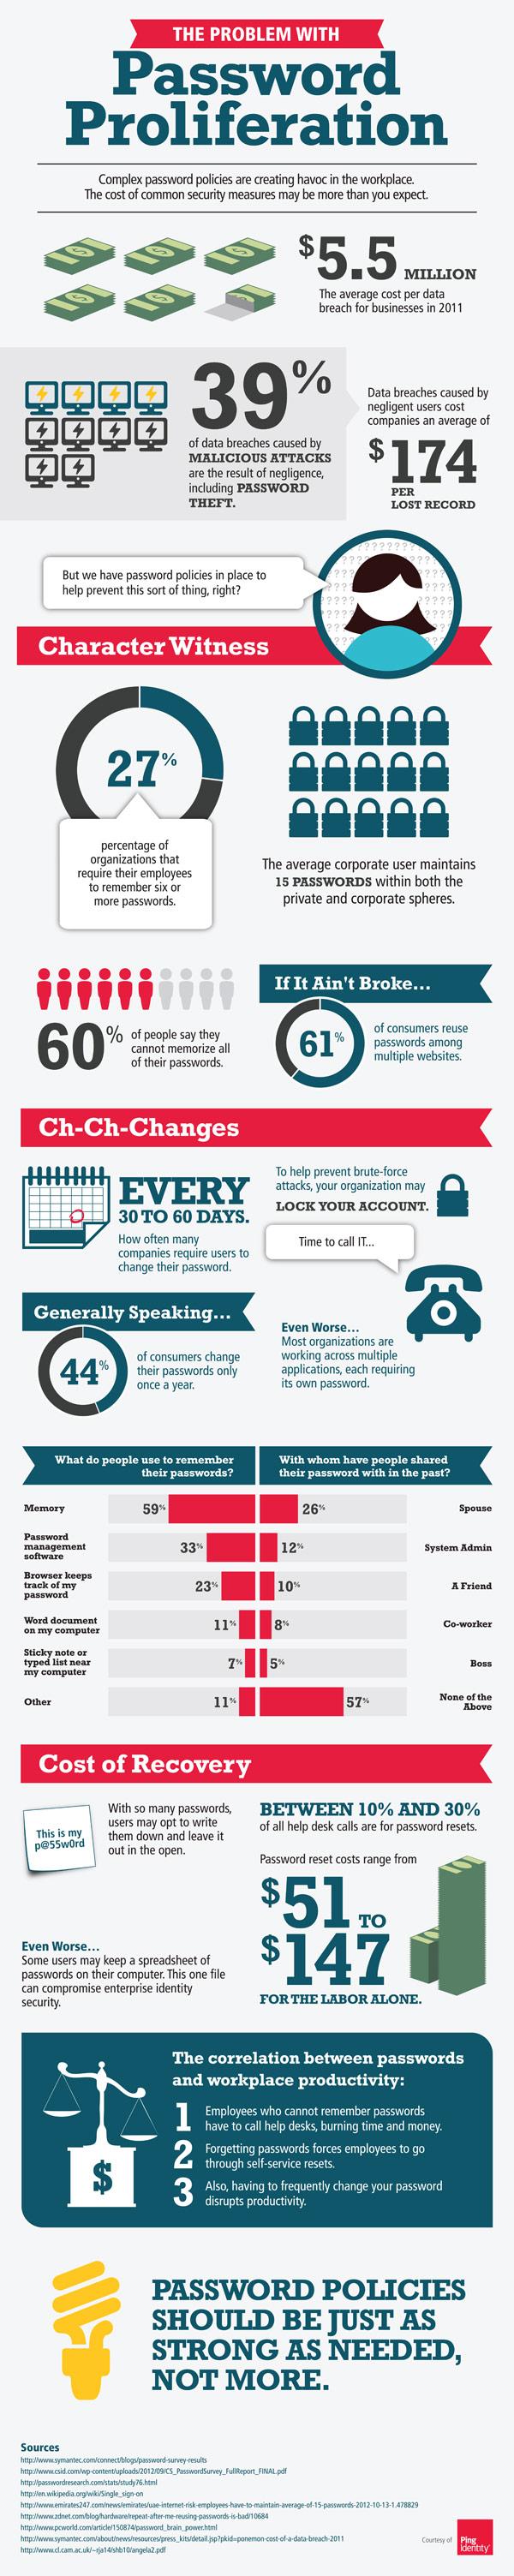 EXP-Passwod_Proliferation_infographic_041513